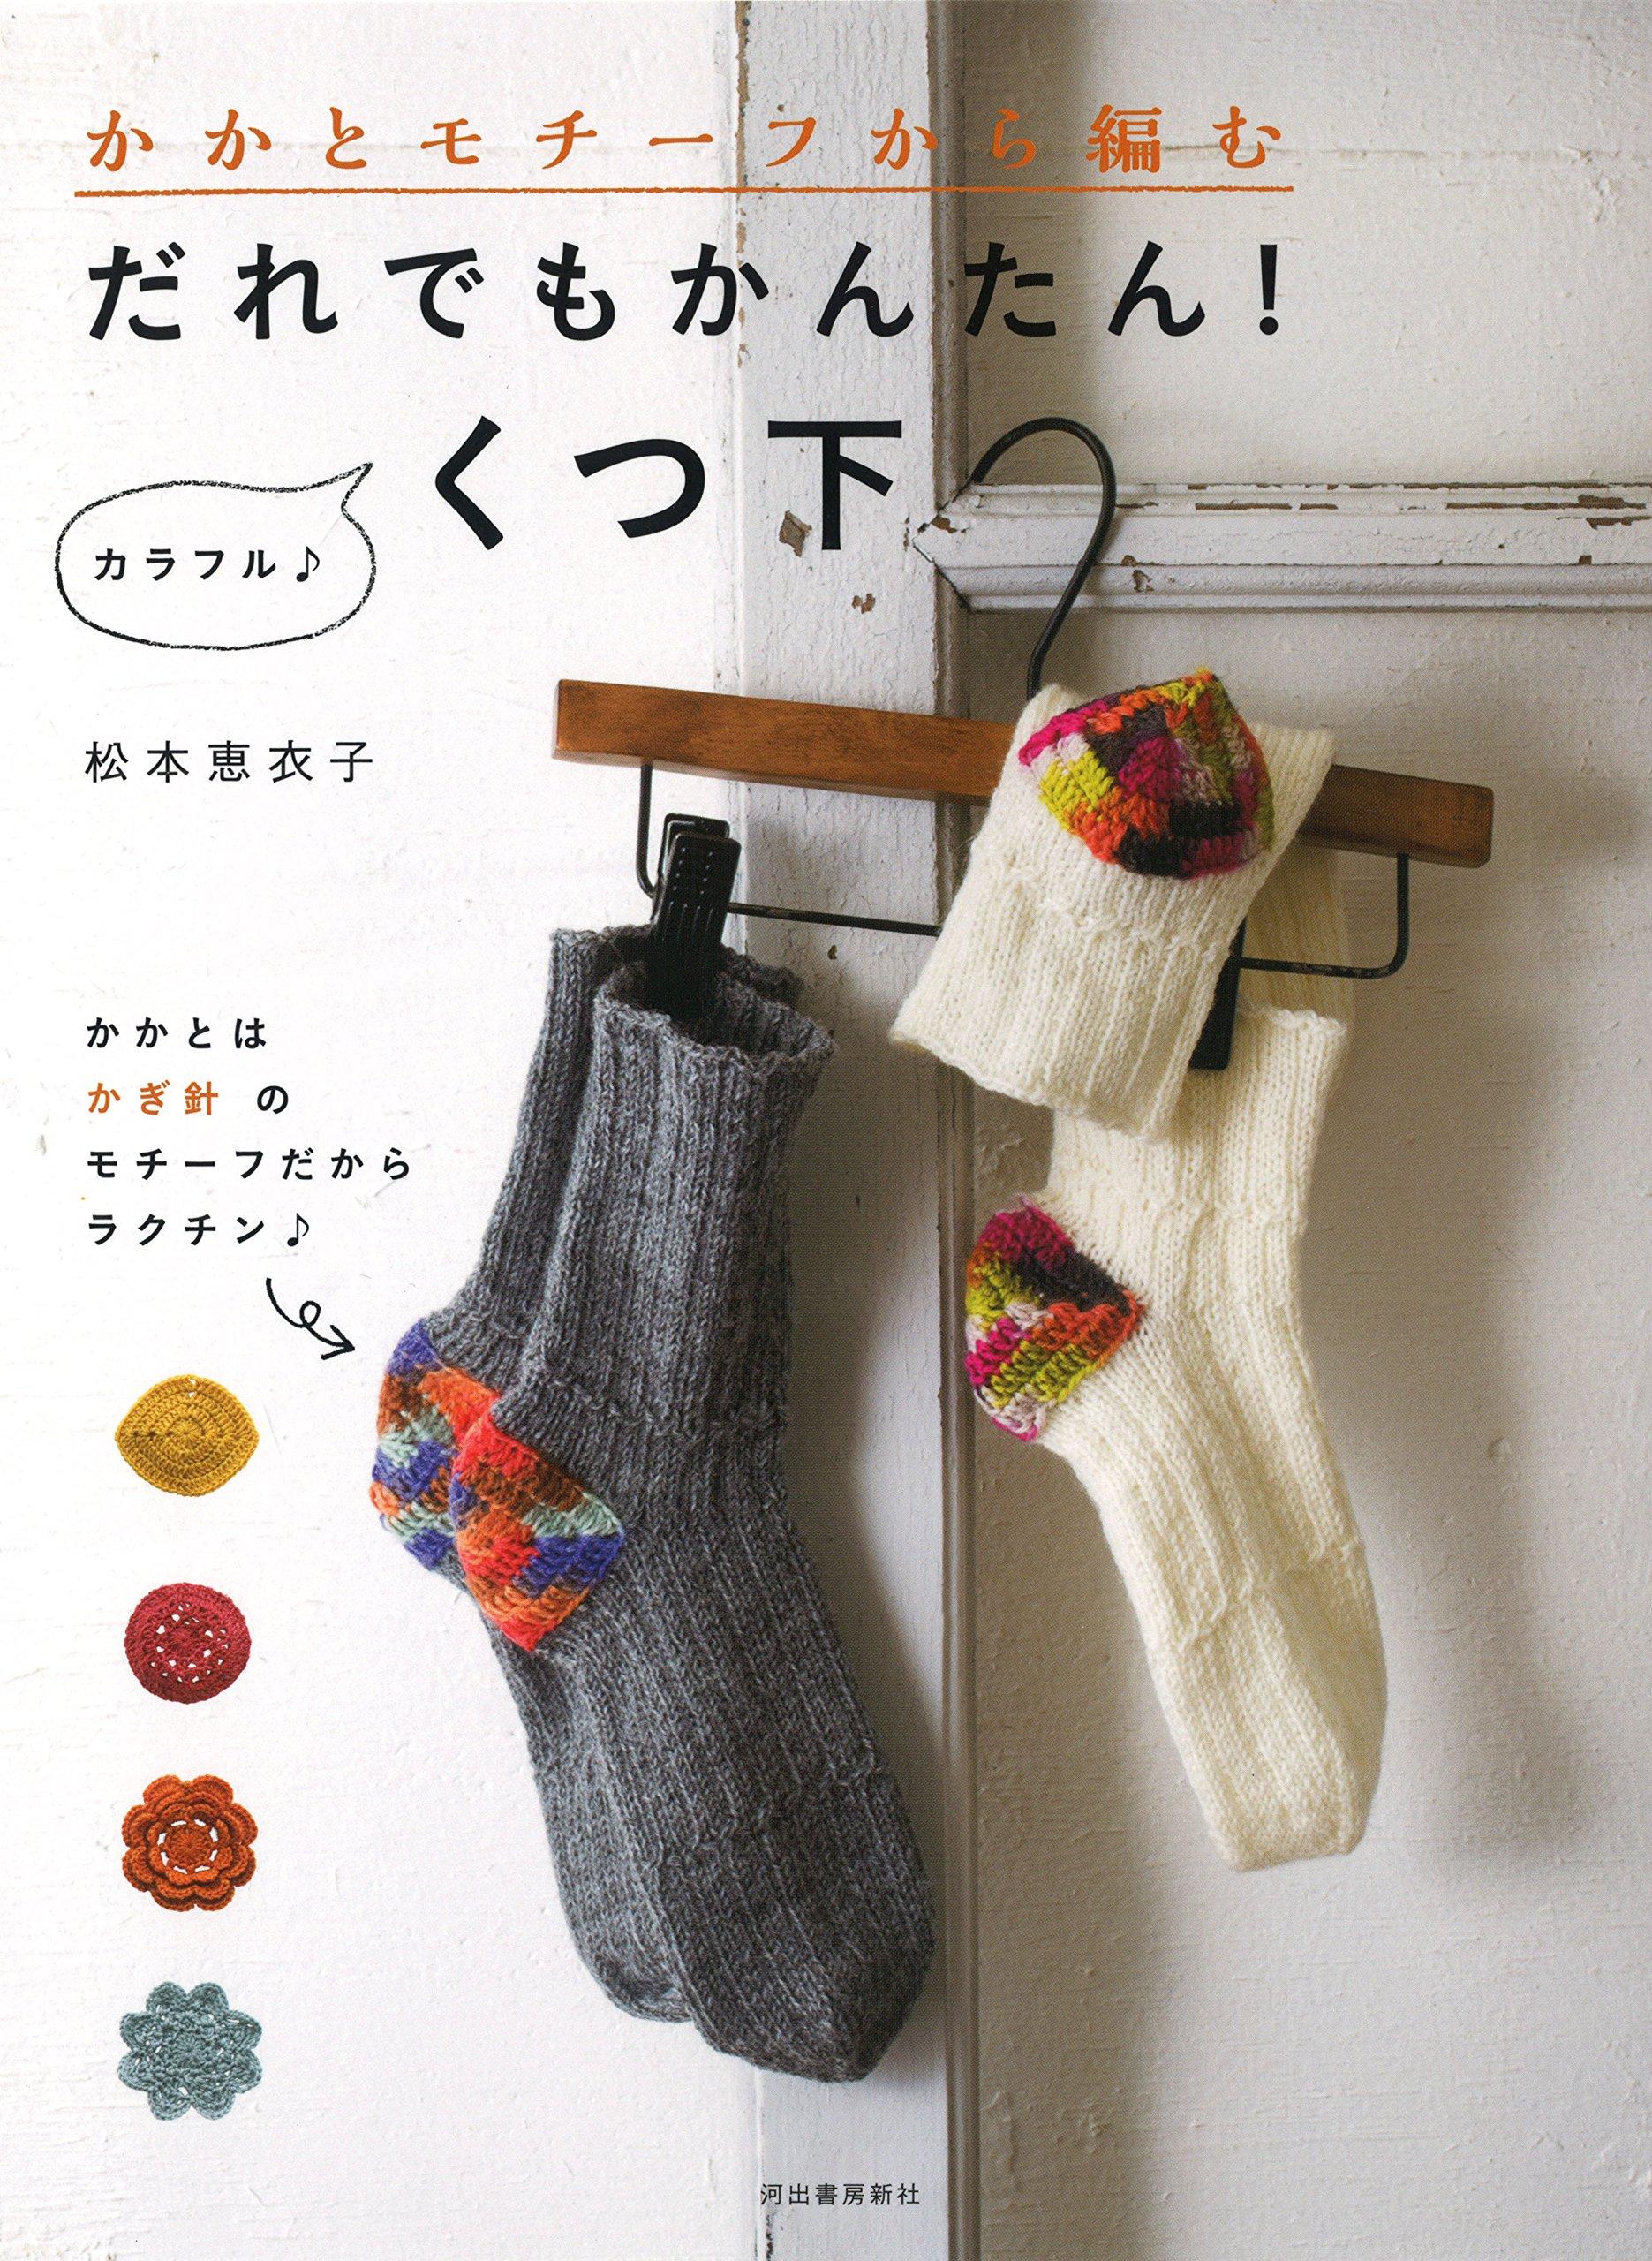 Socks large book